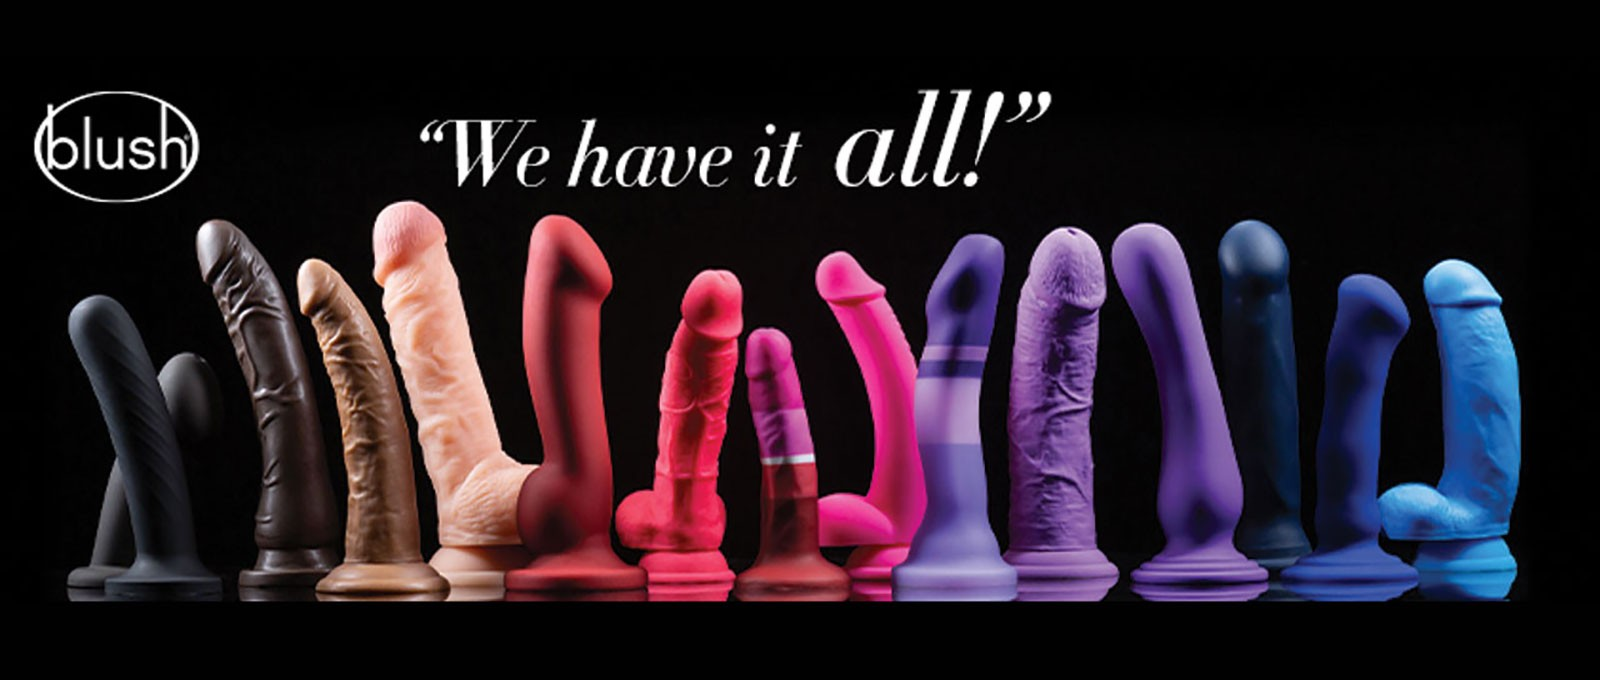 Blush Novelties I Adore Love Sex Toys Dildo BDSM LGBT Gay Bondage Massage Oils Lubes